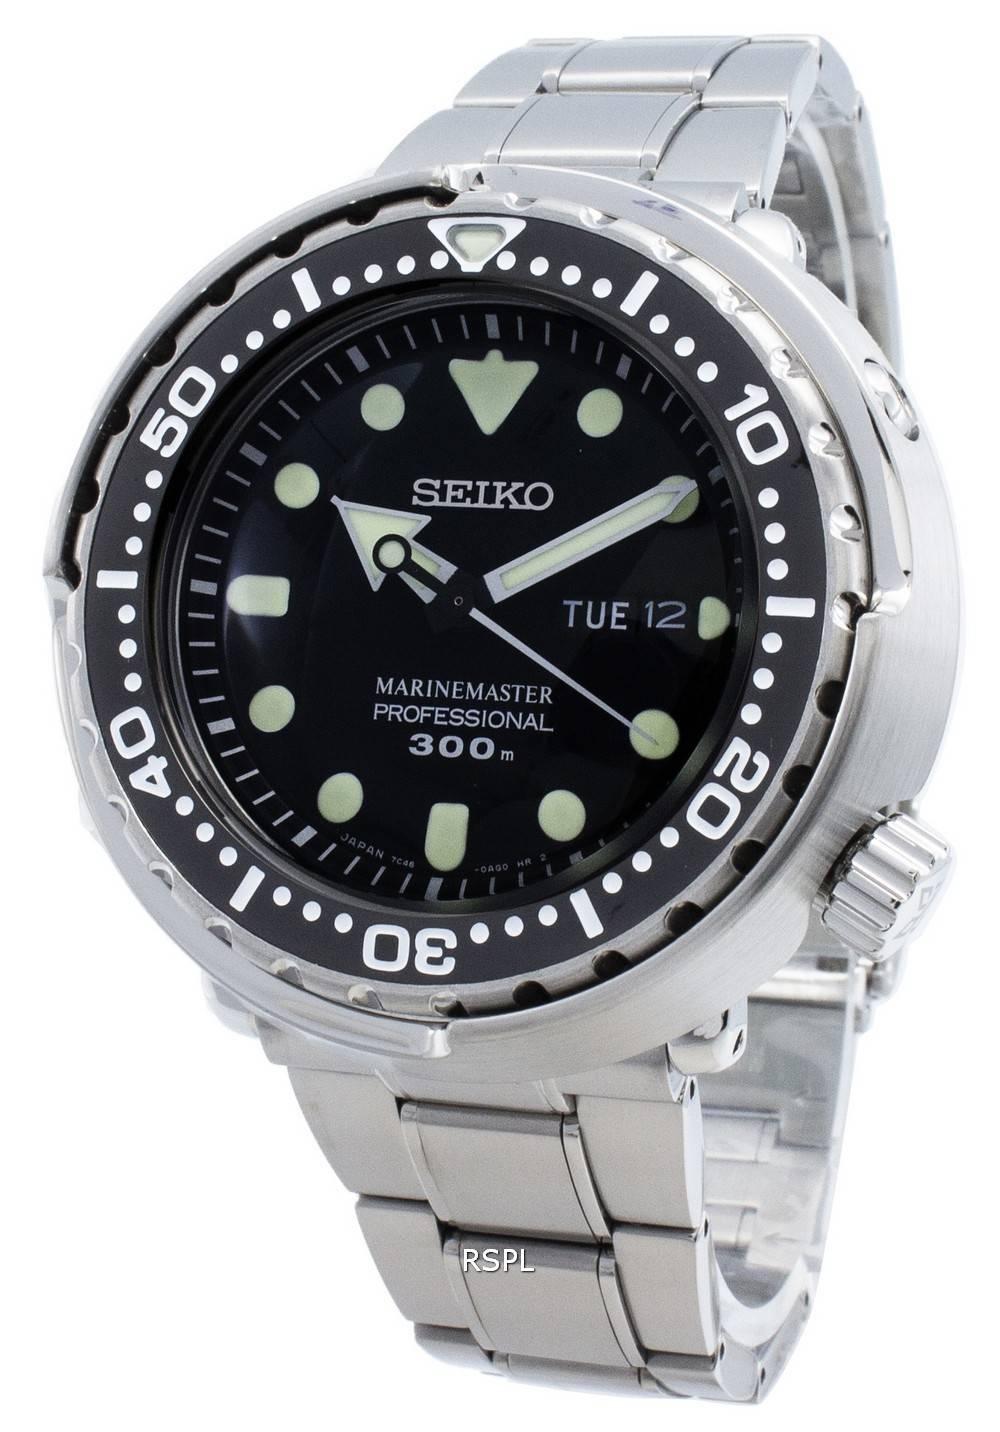 Seiko Prospex MarineMaster Professional 300M SBBN031 miesten kello